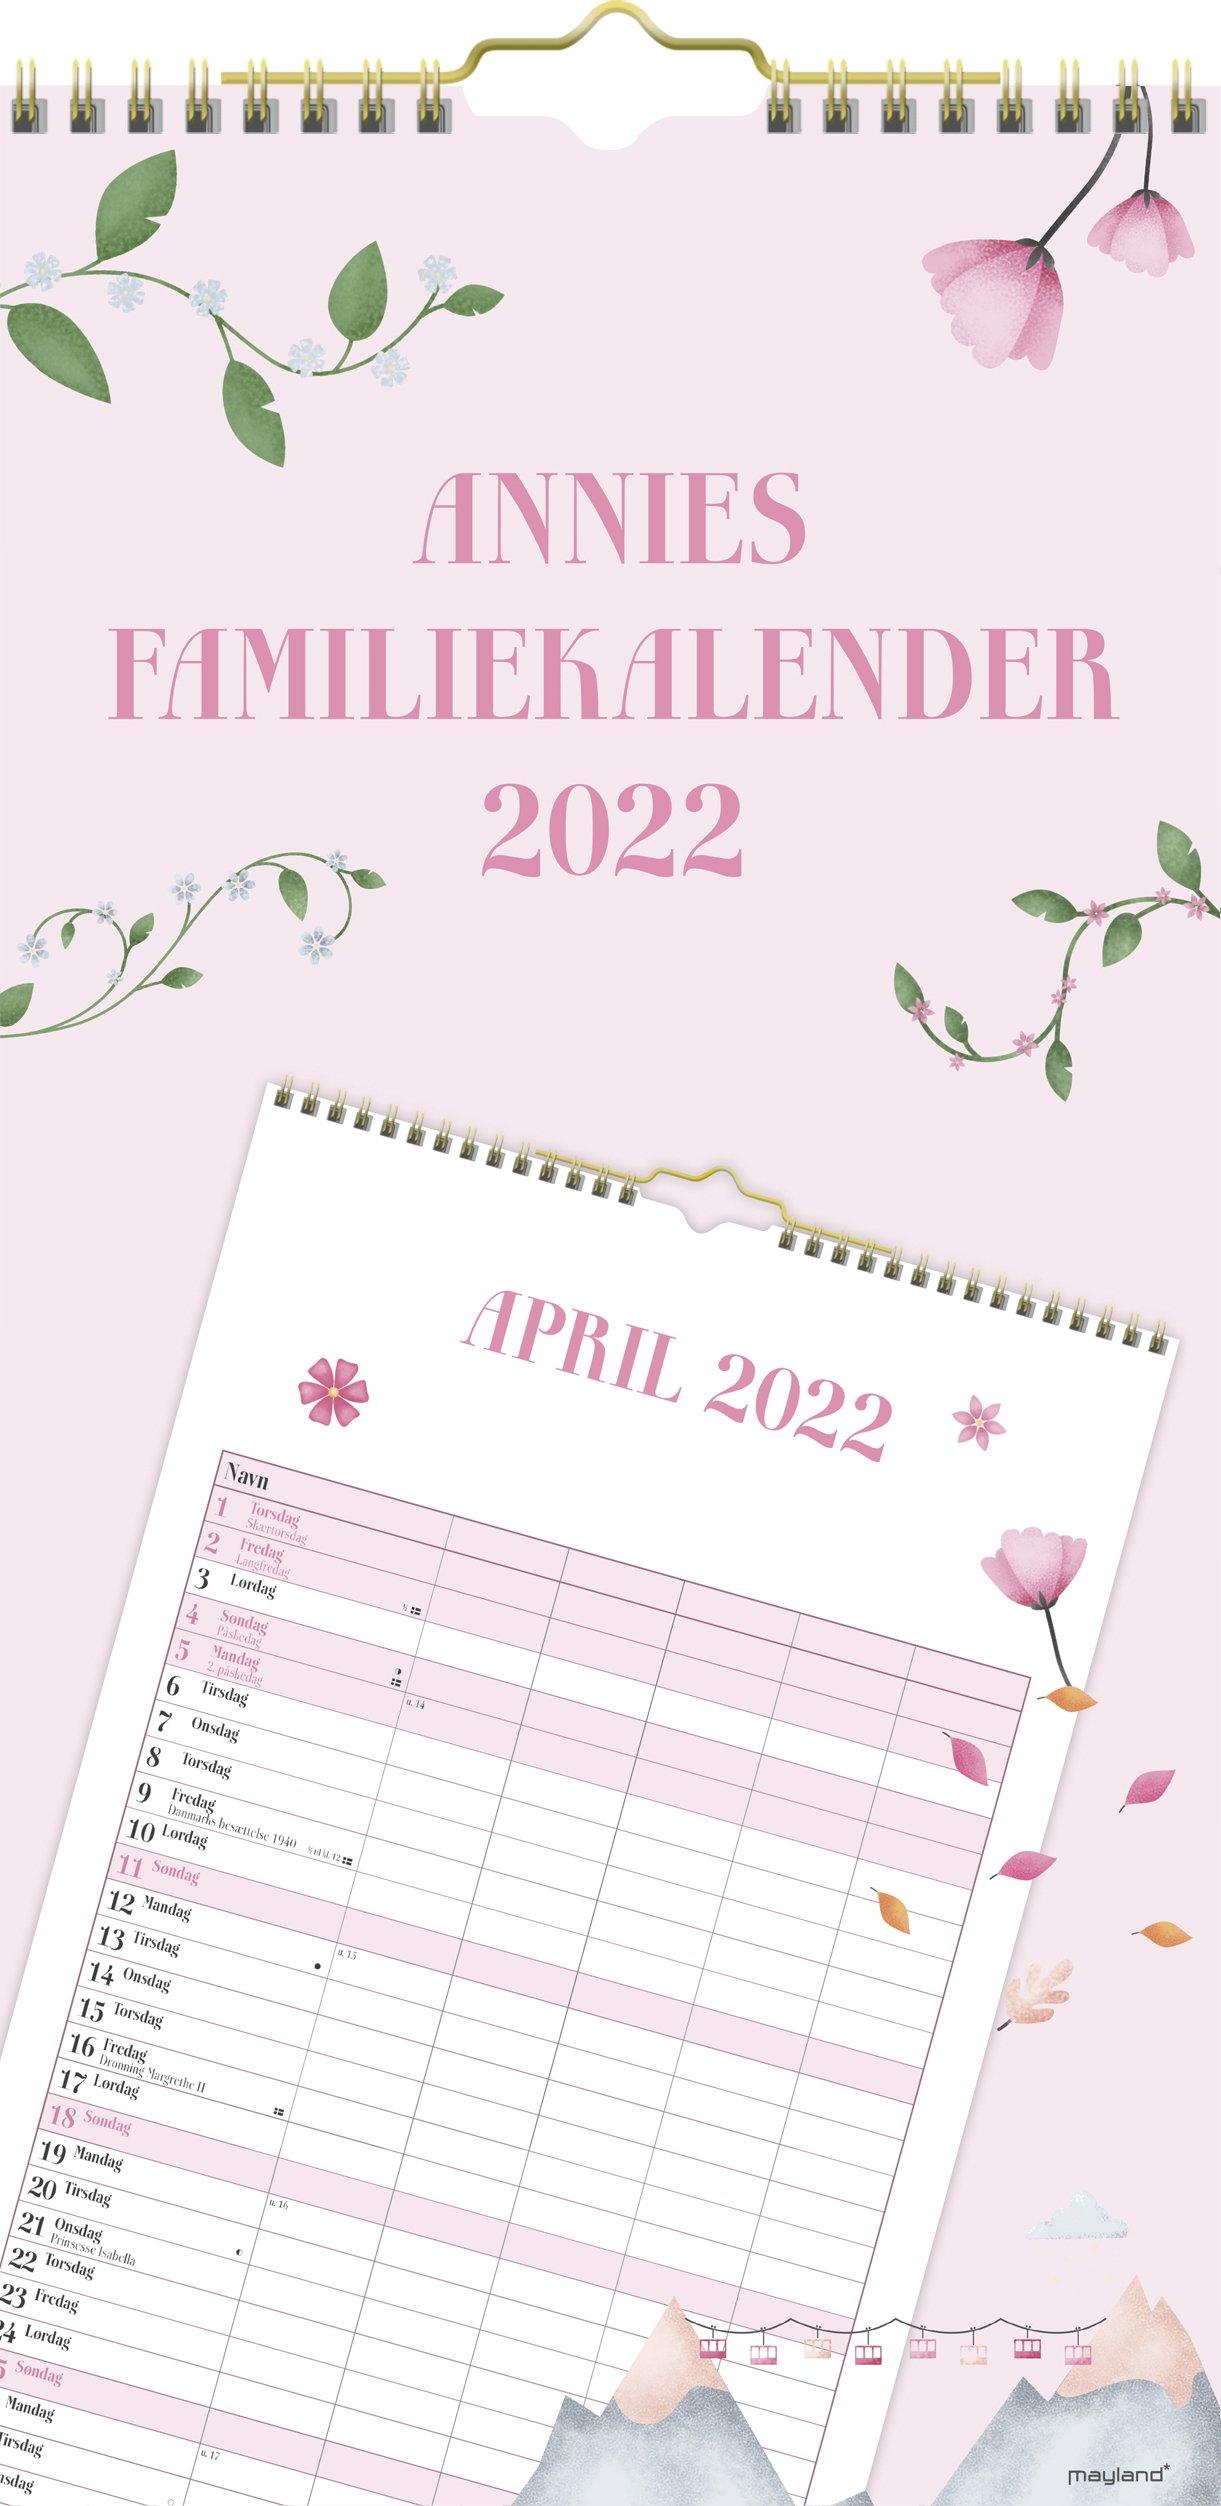 Mayland Annies Familiekalender  2022